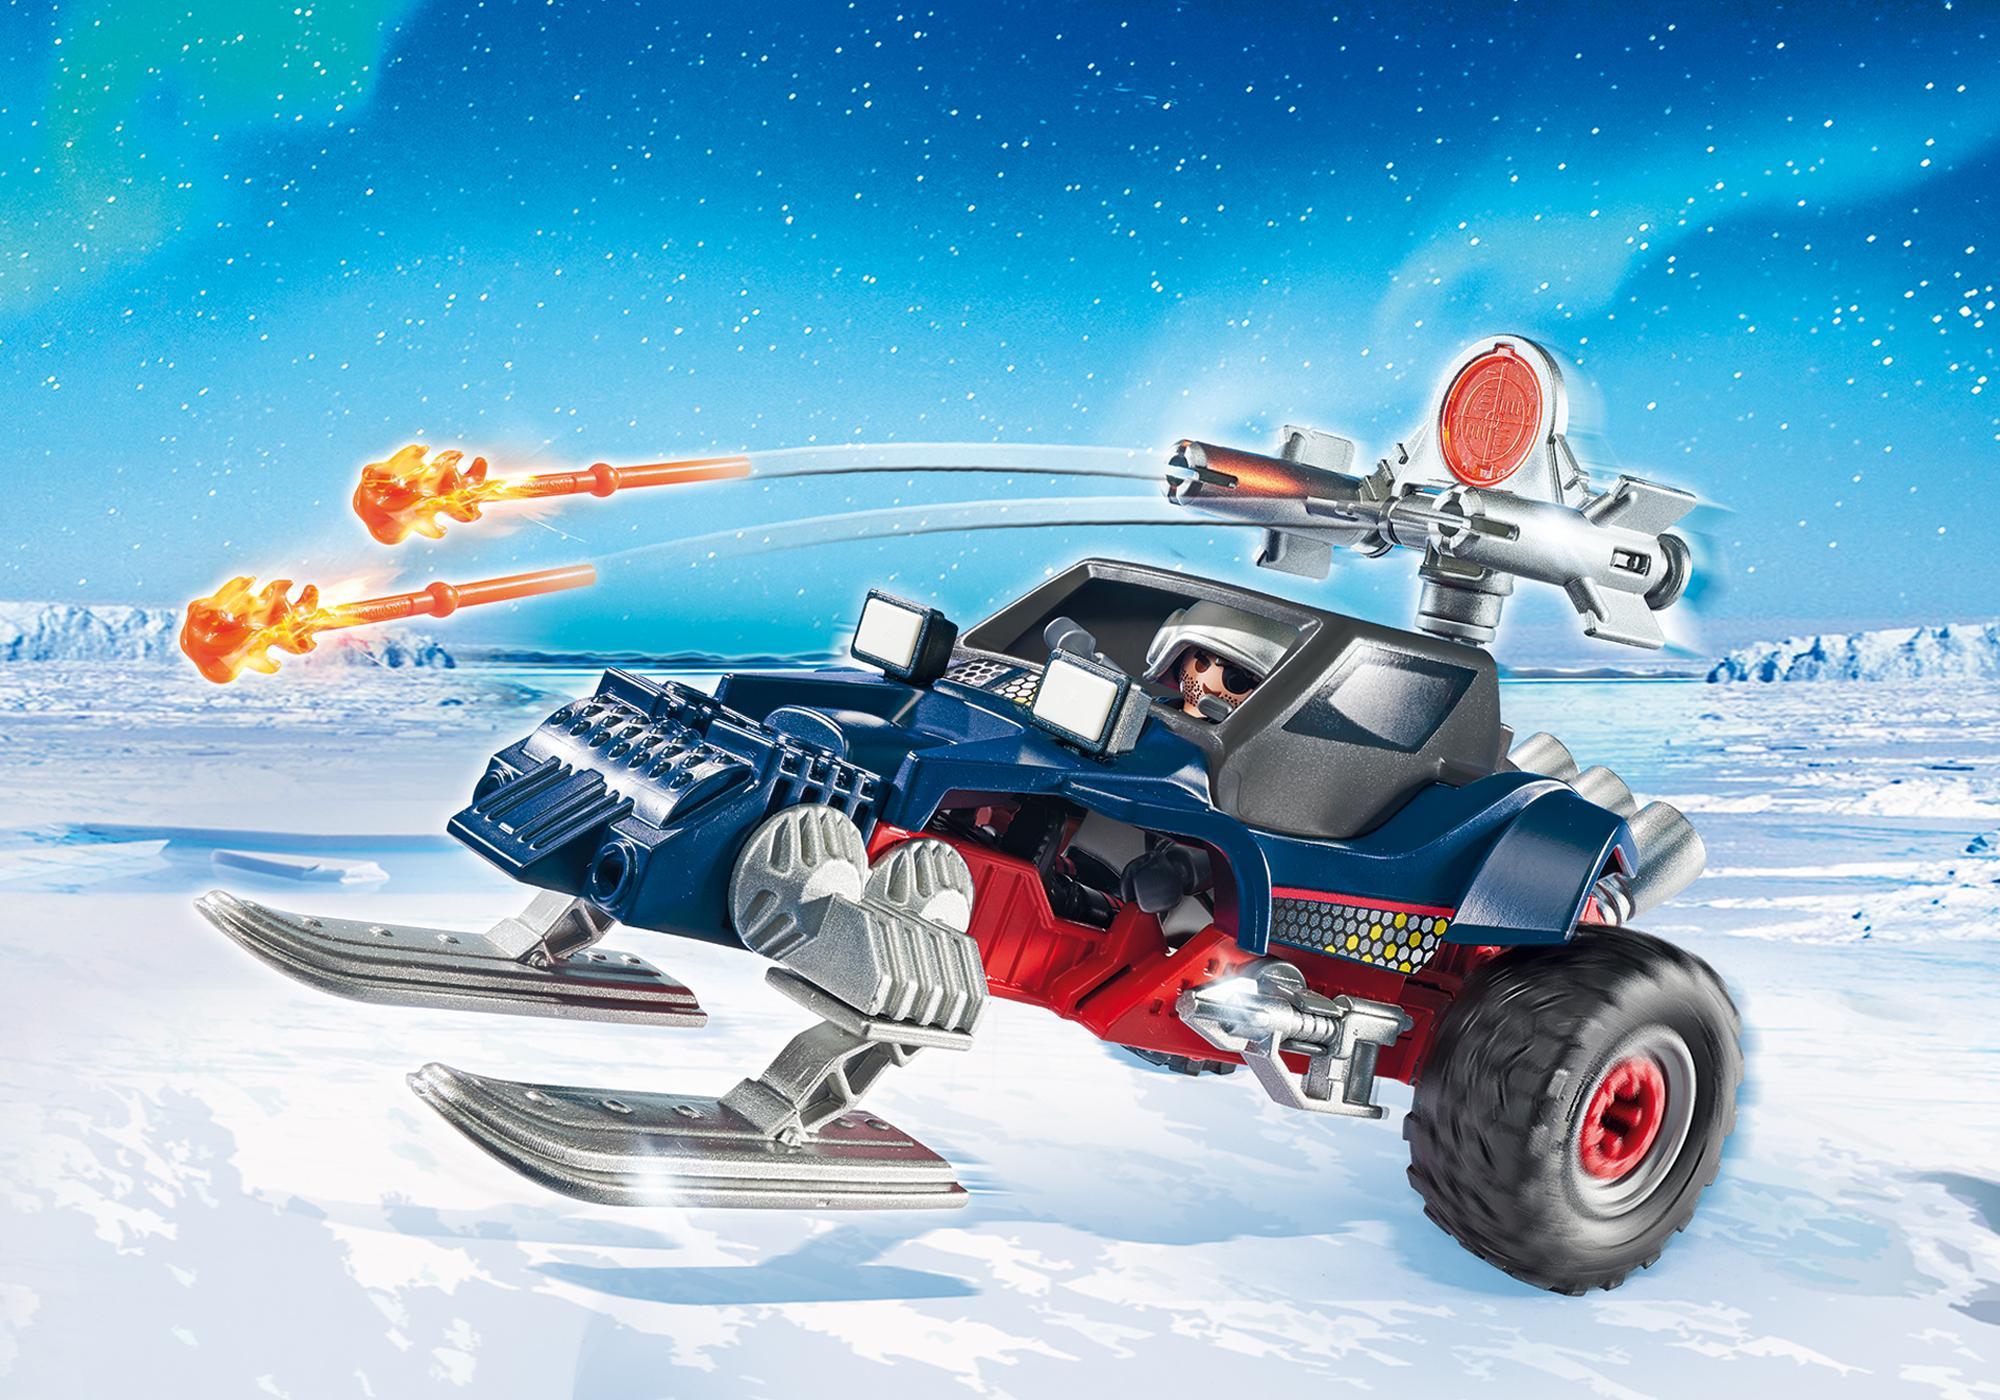 http://media.playmobil.com/i/playmobil/9058_product_detail/Eispiraten-Racer